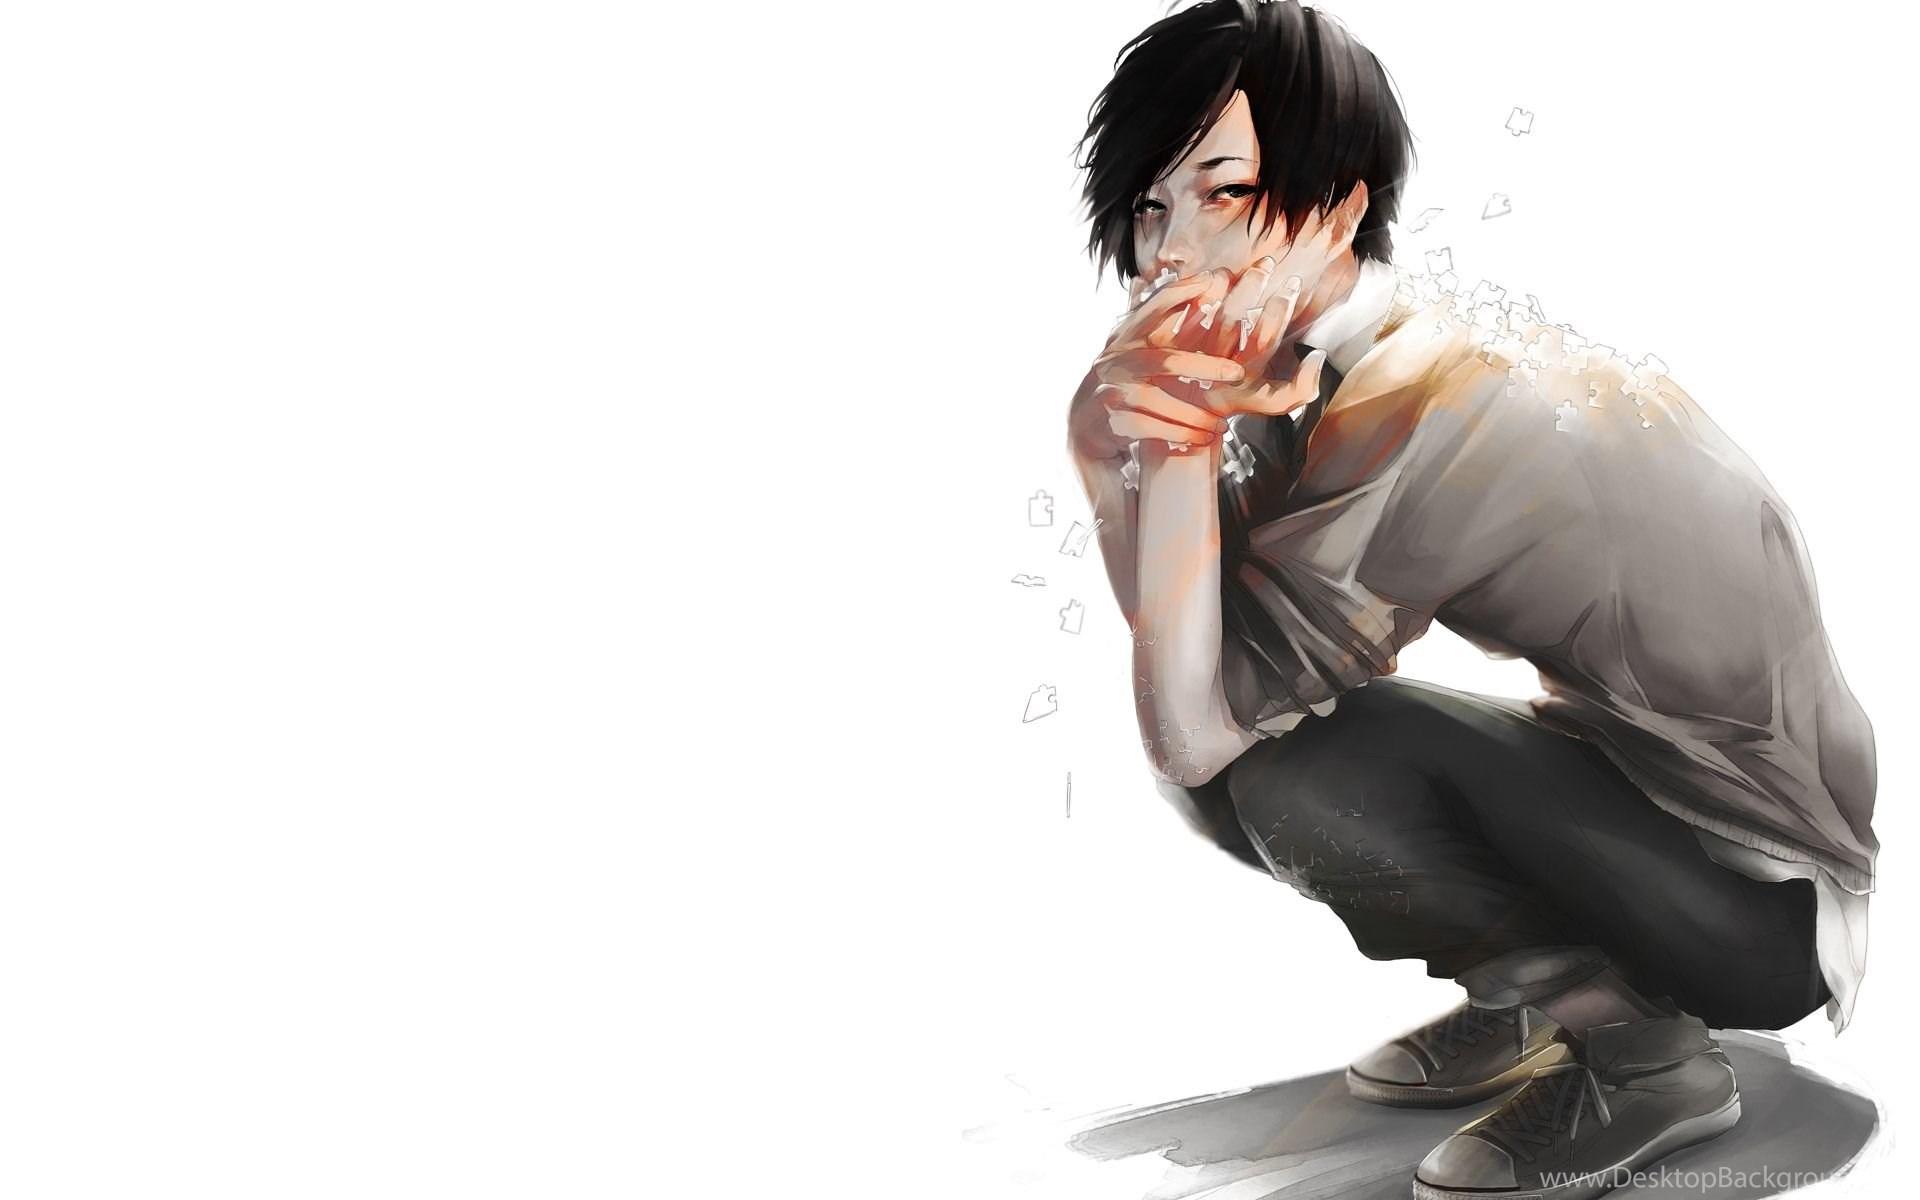 Chikage Kazama Anime Cool Boy Render Anime Art Texture